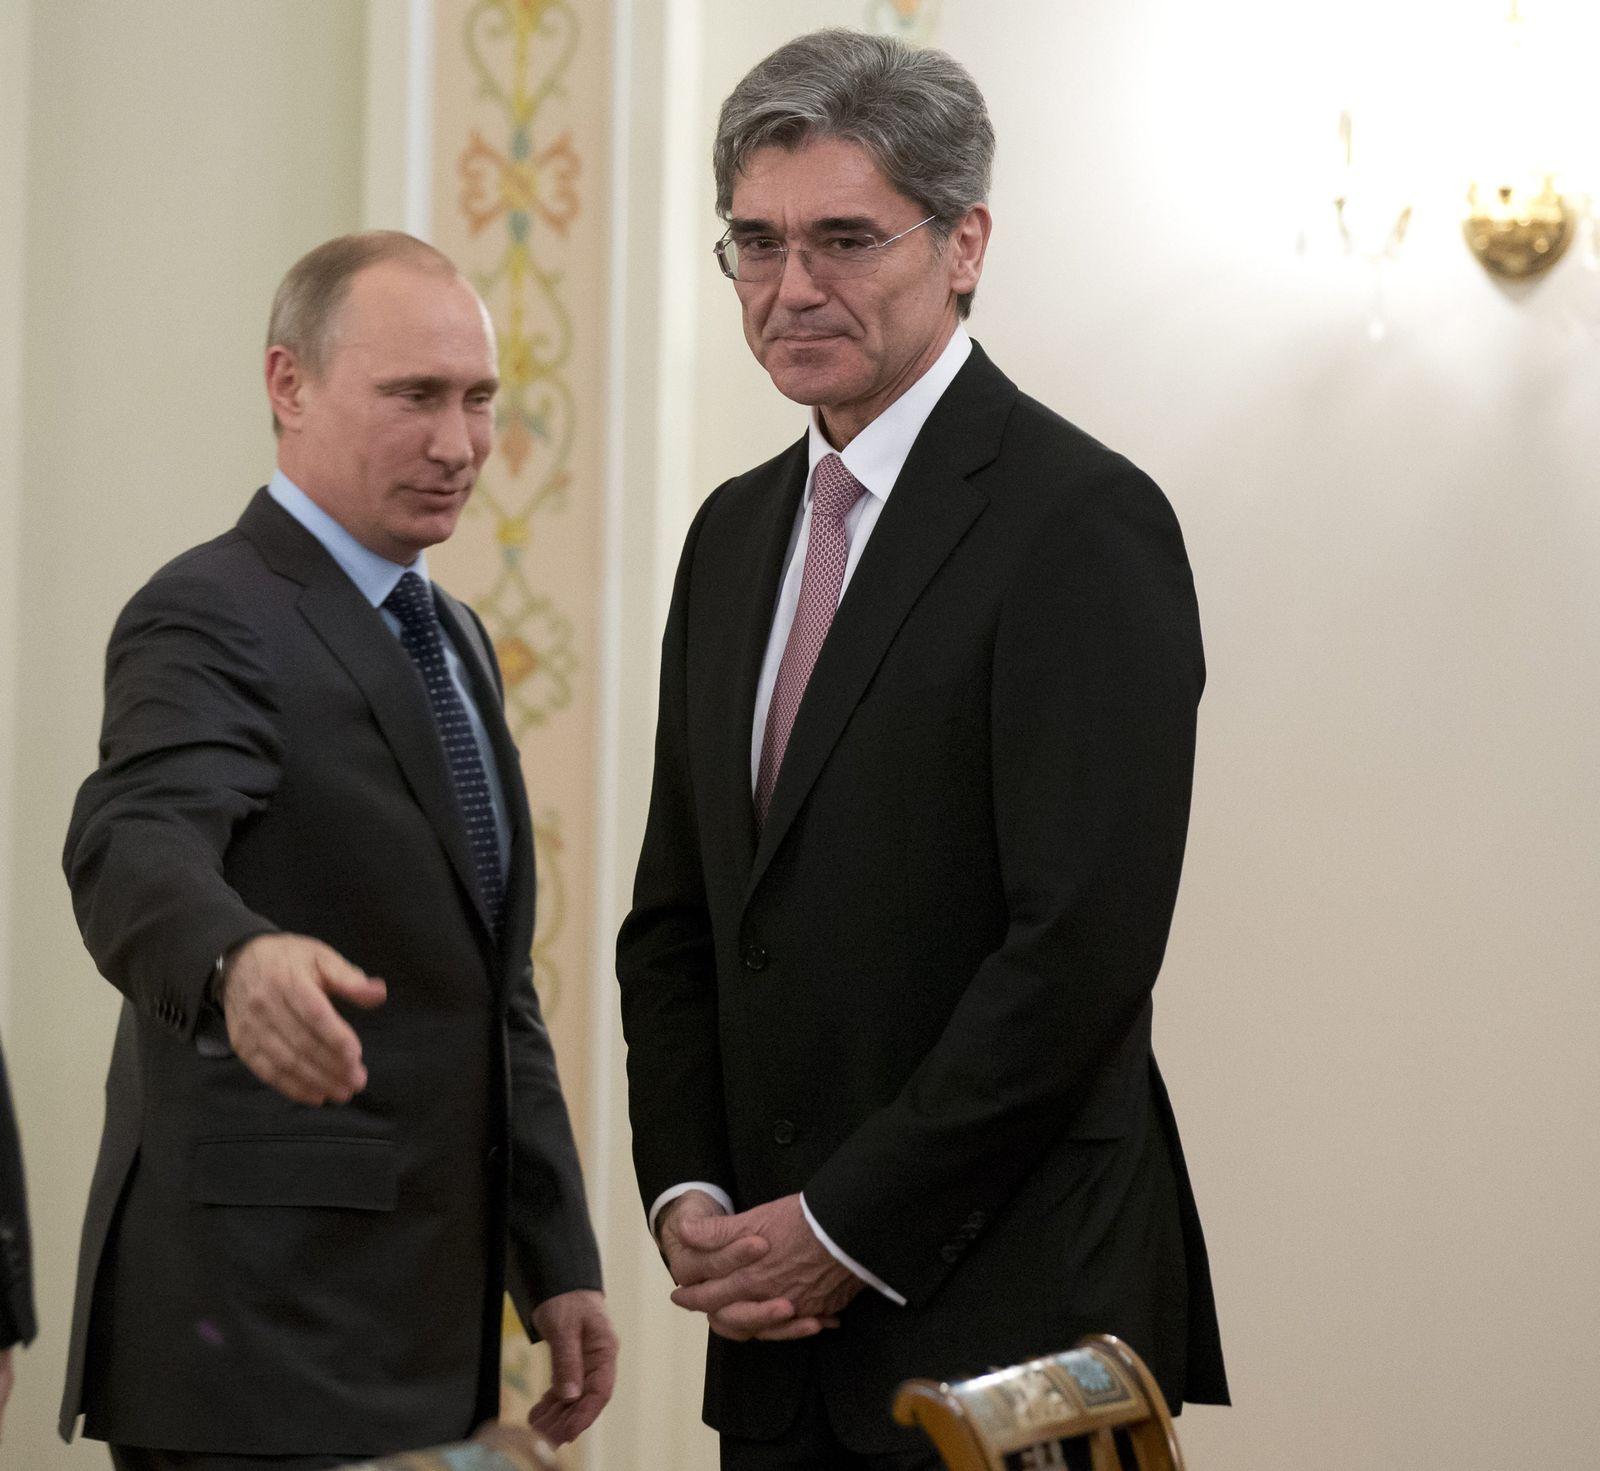 Putin meets Siemens CEO Kaeser